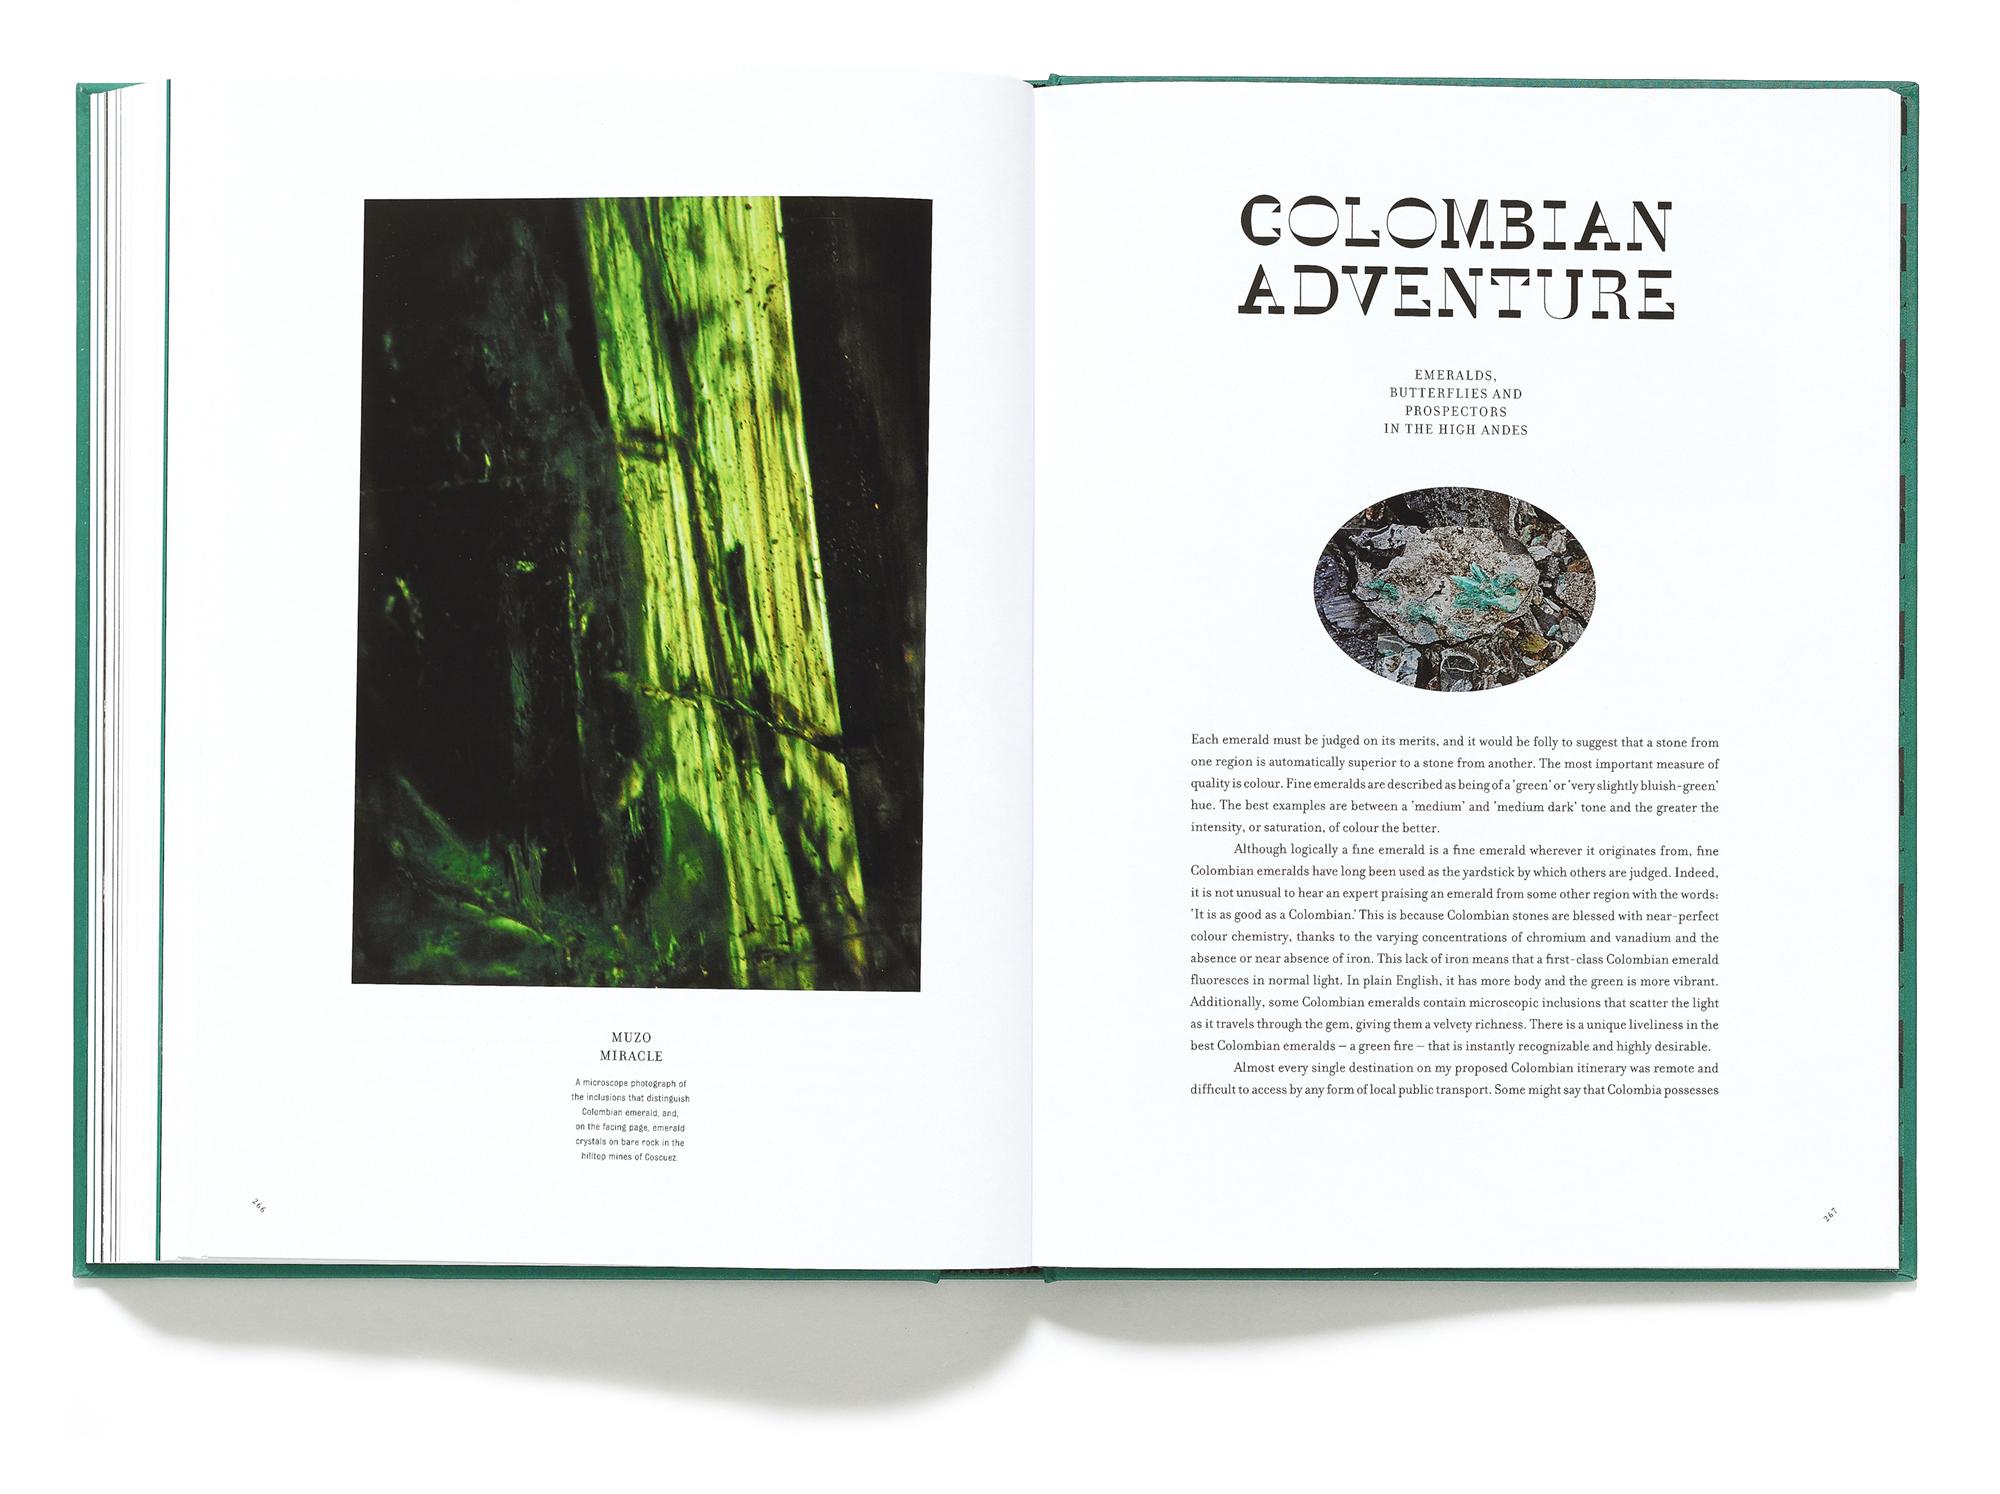 Emerald_Violette Editions_59.jpg